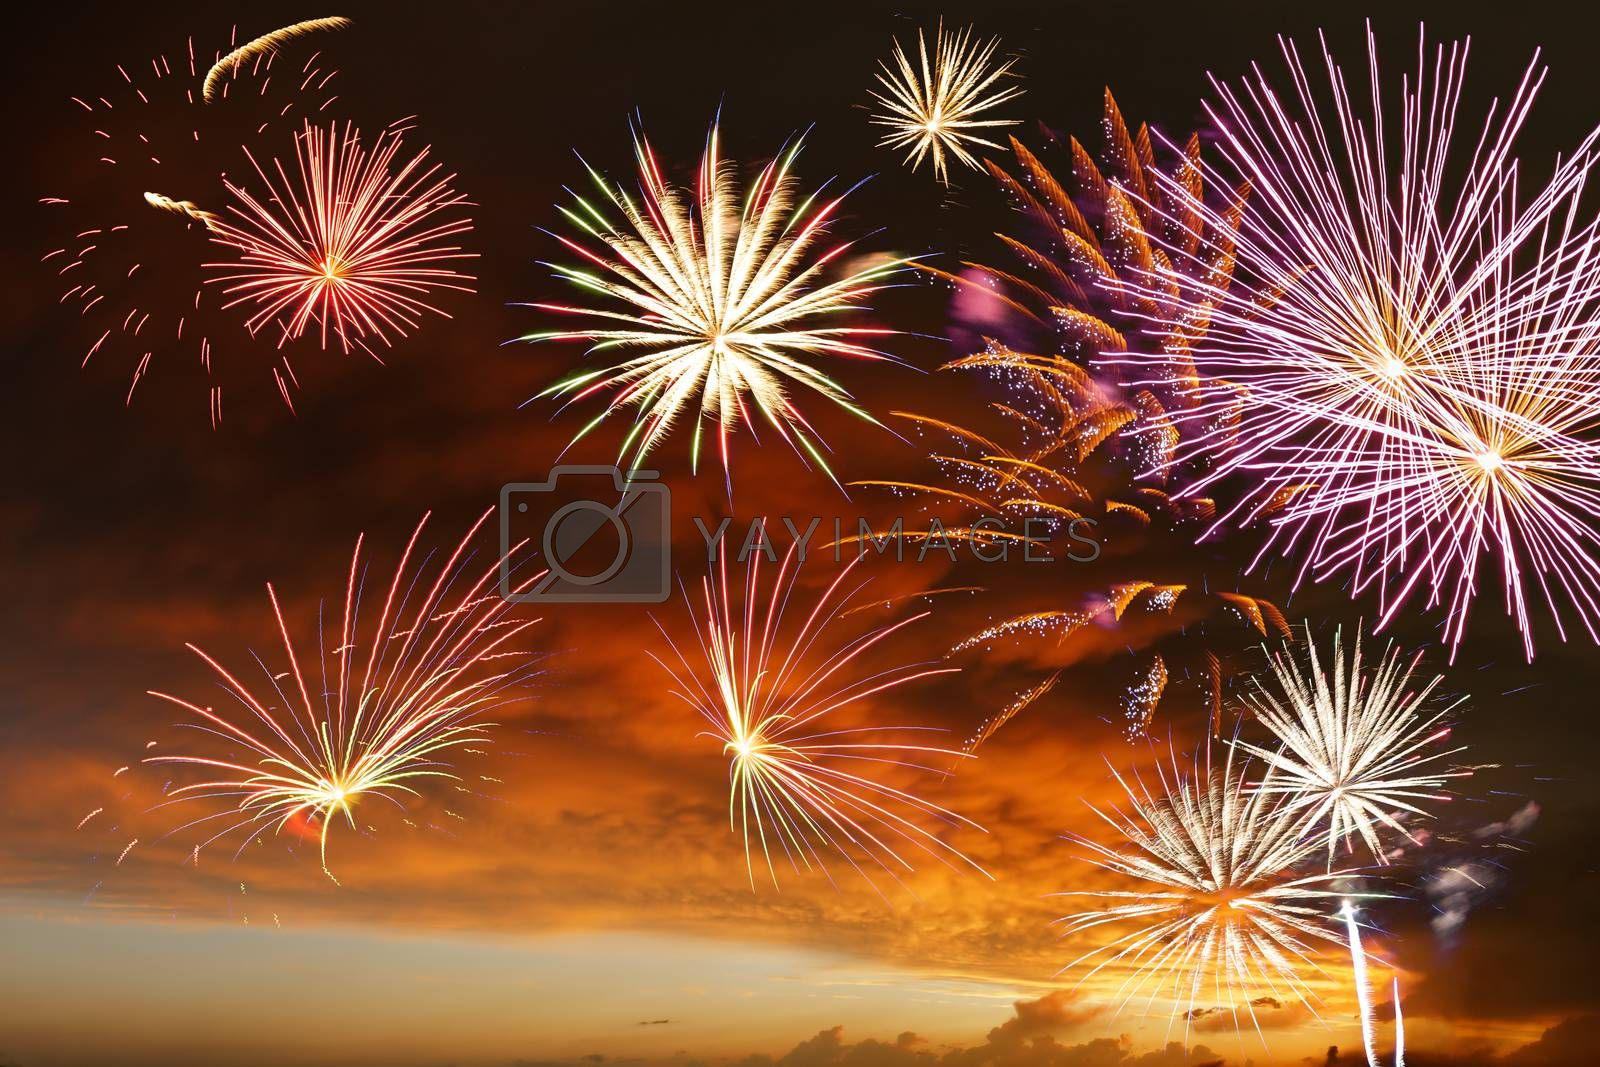 Majestic fireworks in evening sky